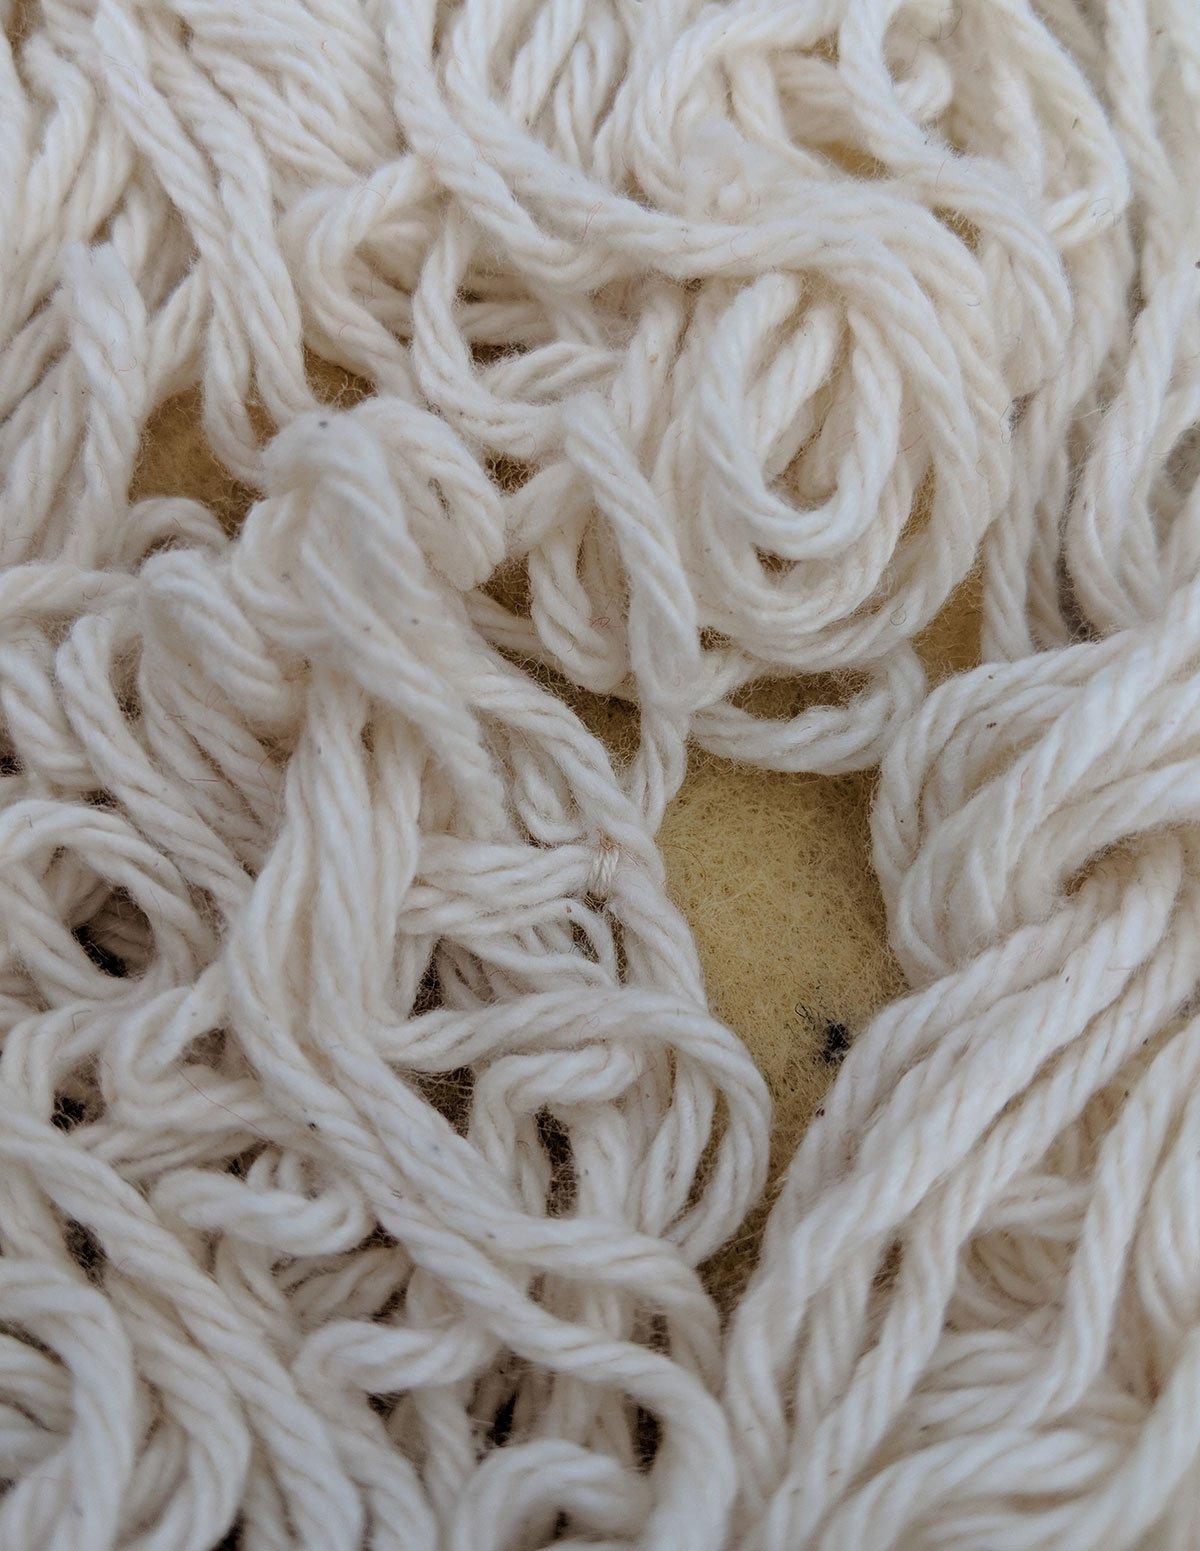 keeping play spaghetti yarn from tangling